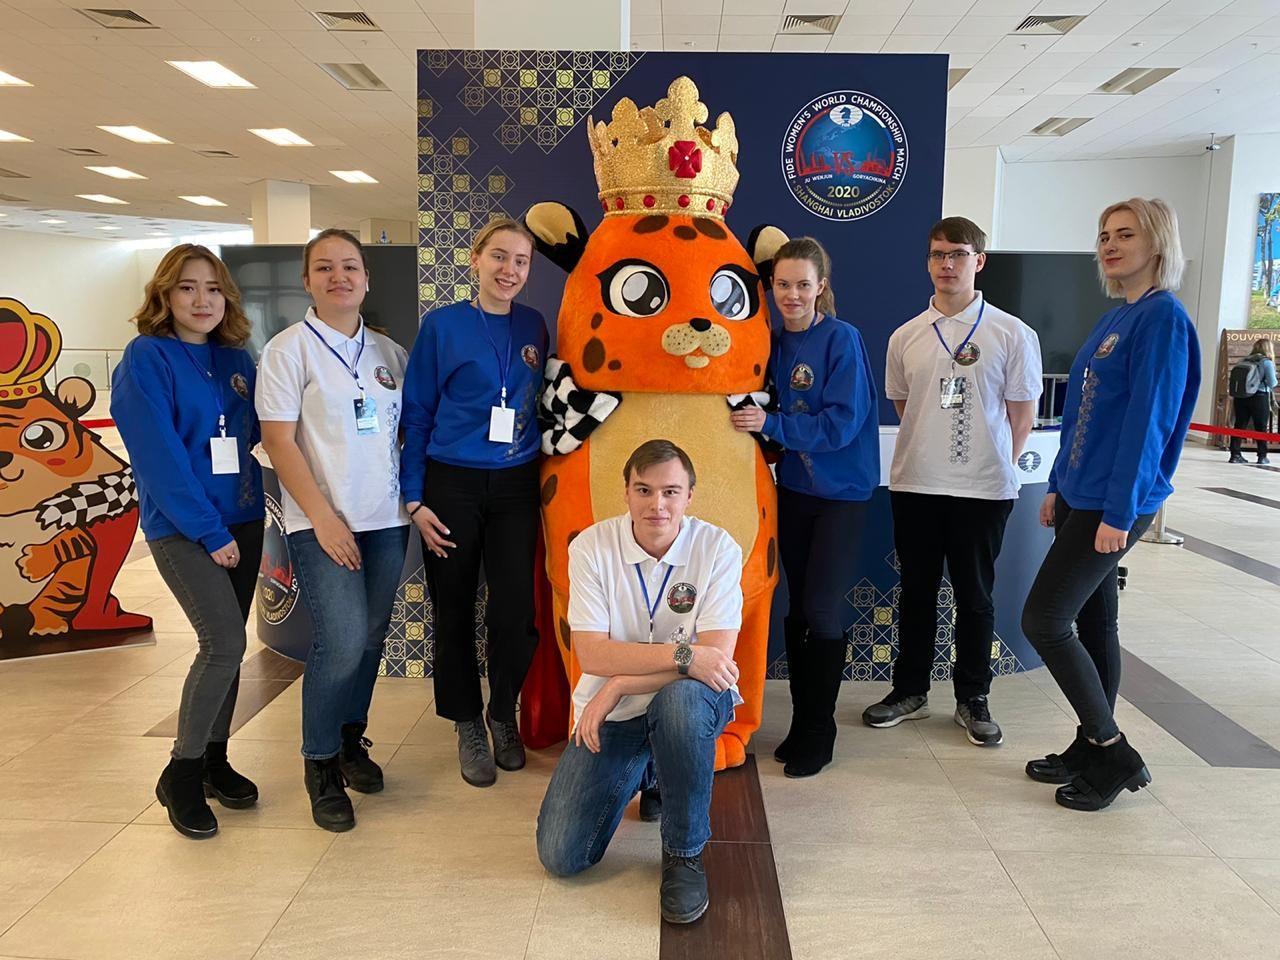 Волонтерская работа на чемпионате мира по шахматам